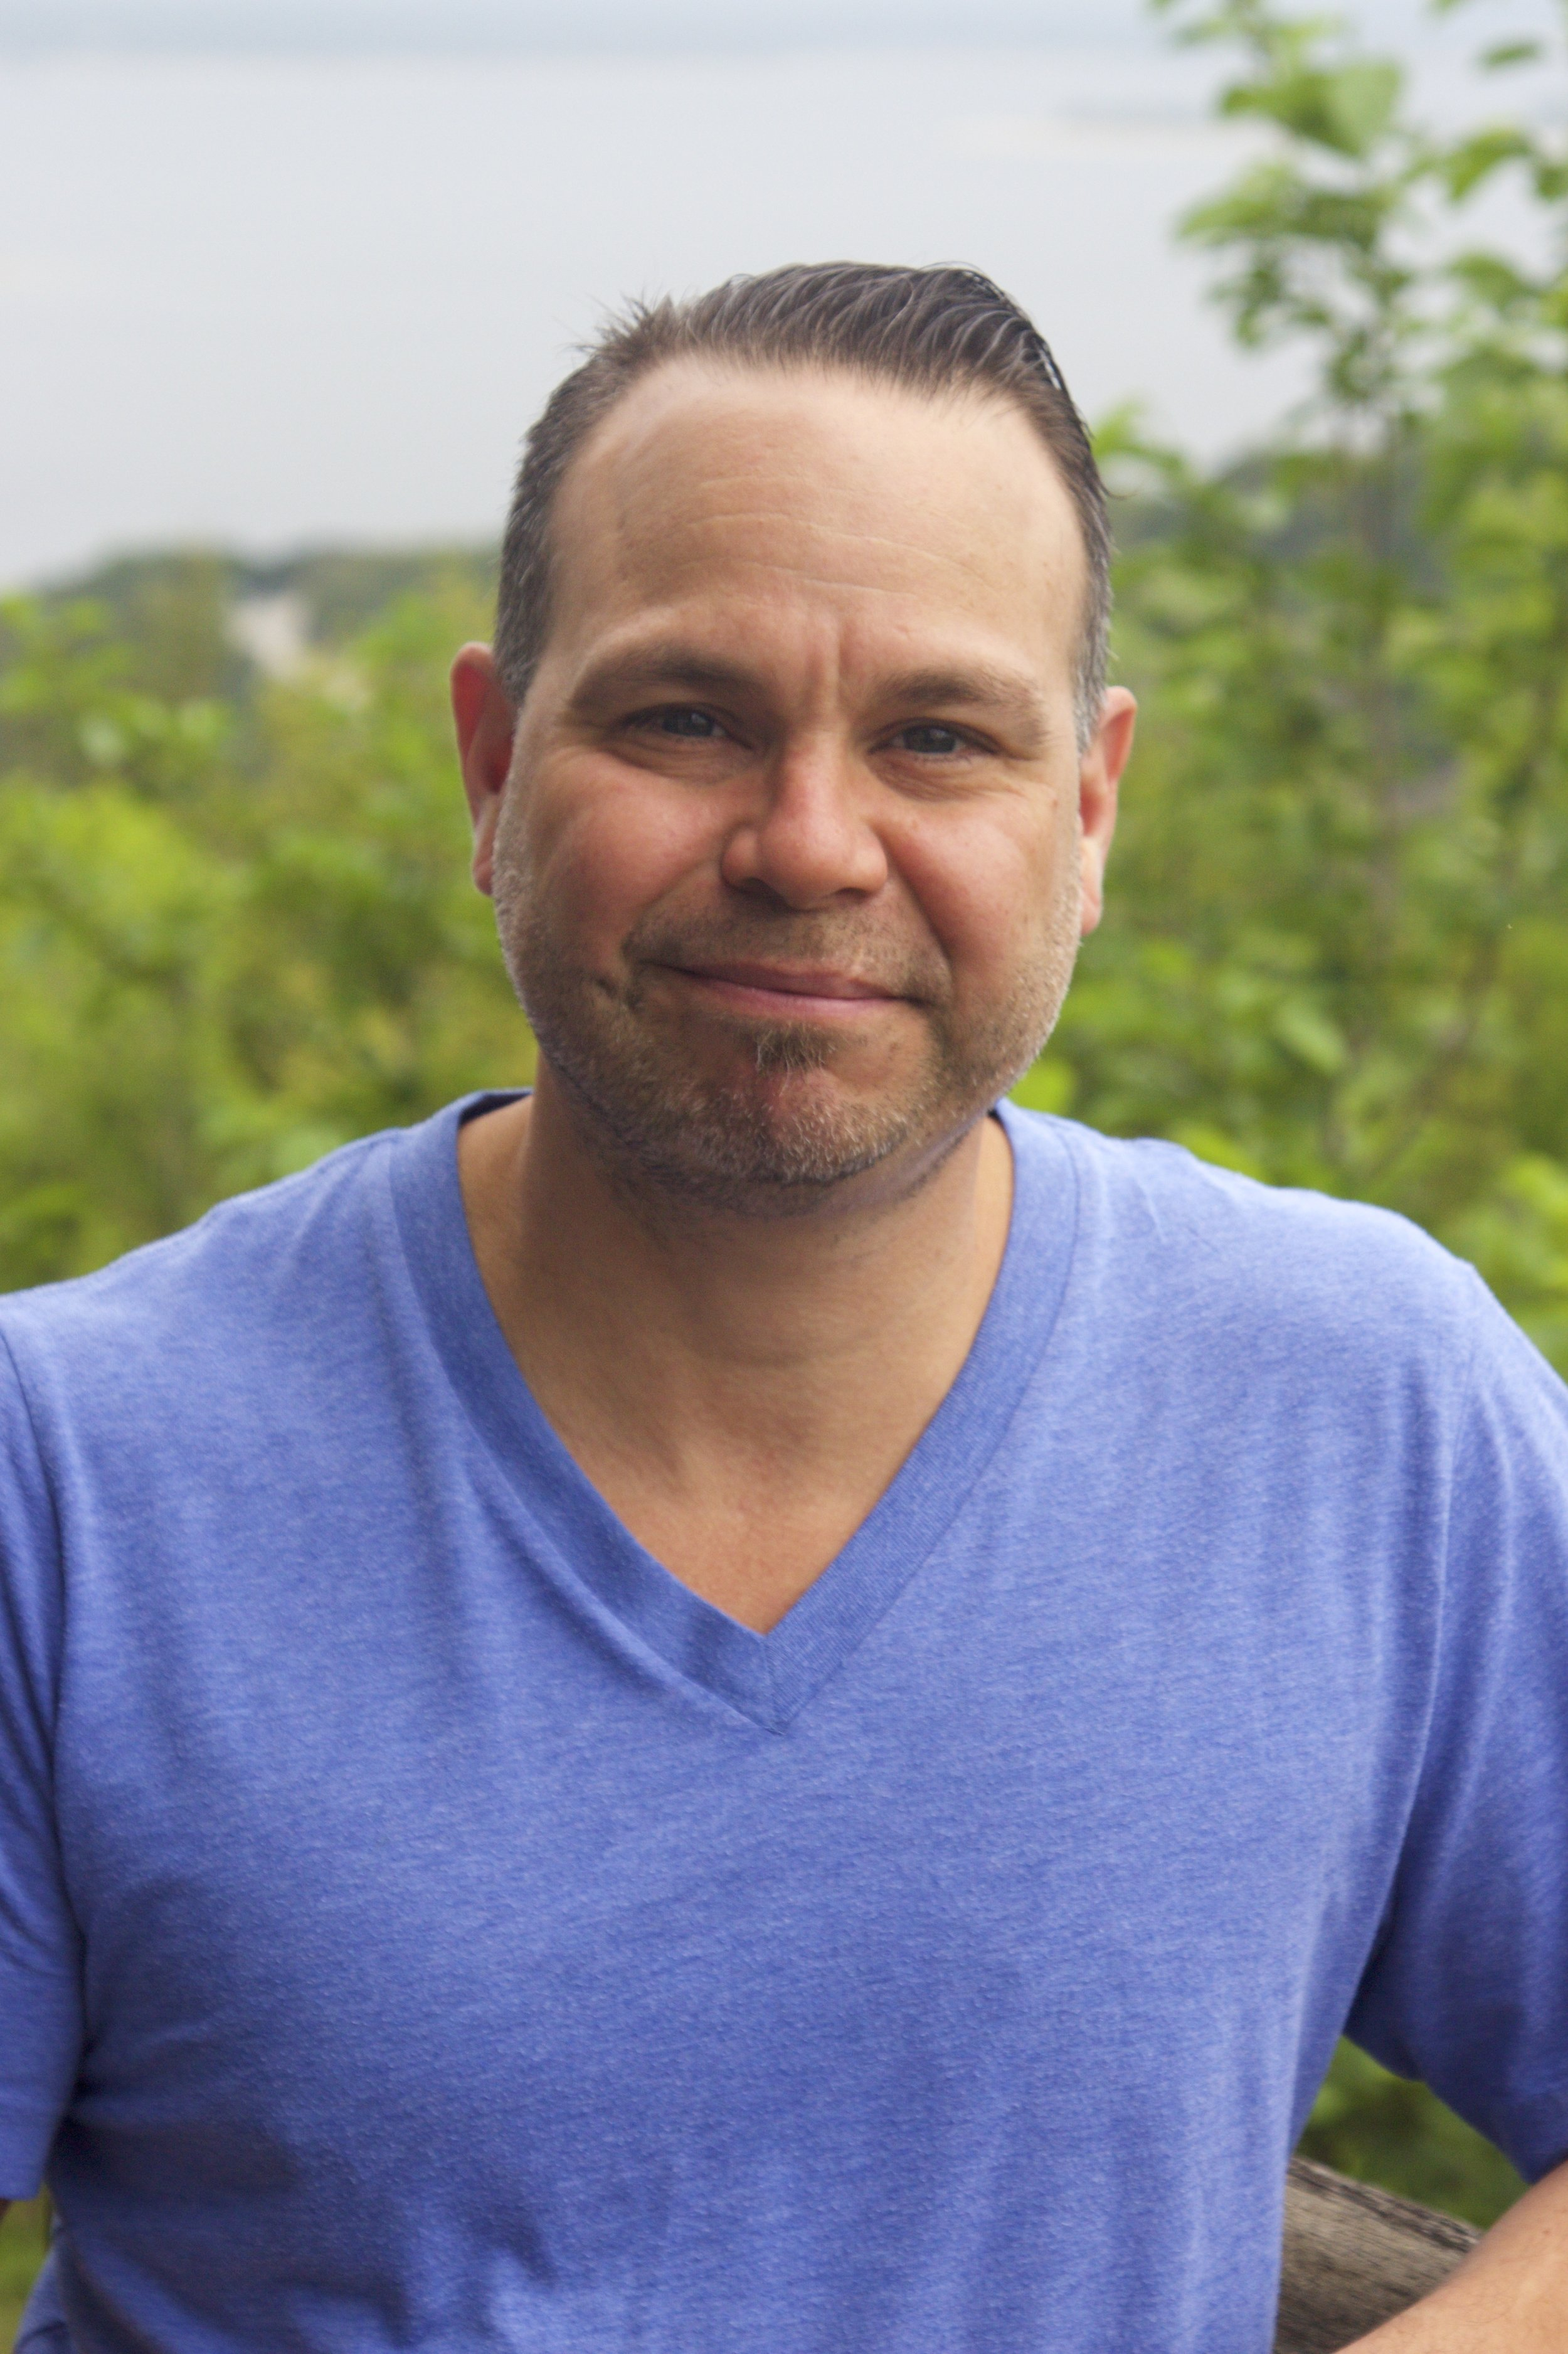 Michael Balli, Facilities Manager